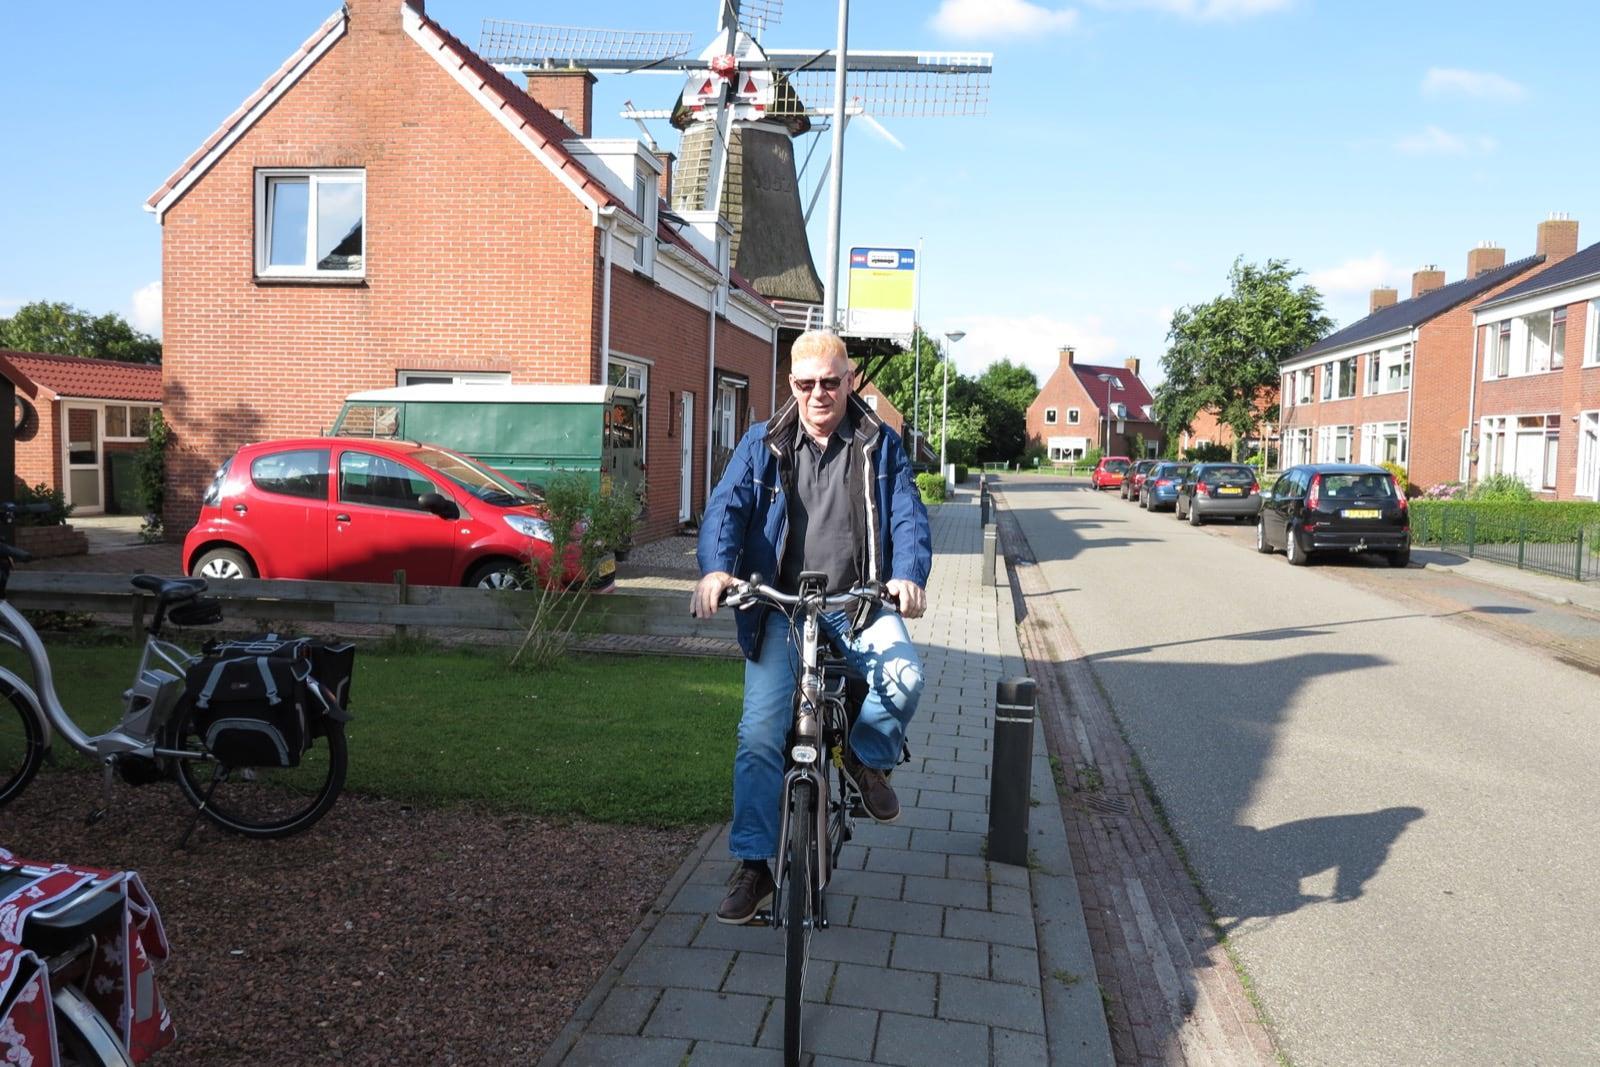 et-fiets-en-fietser-43-thesinger-fietstocht-17-juni-2016---aries-sibma-oi.jpg